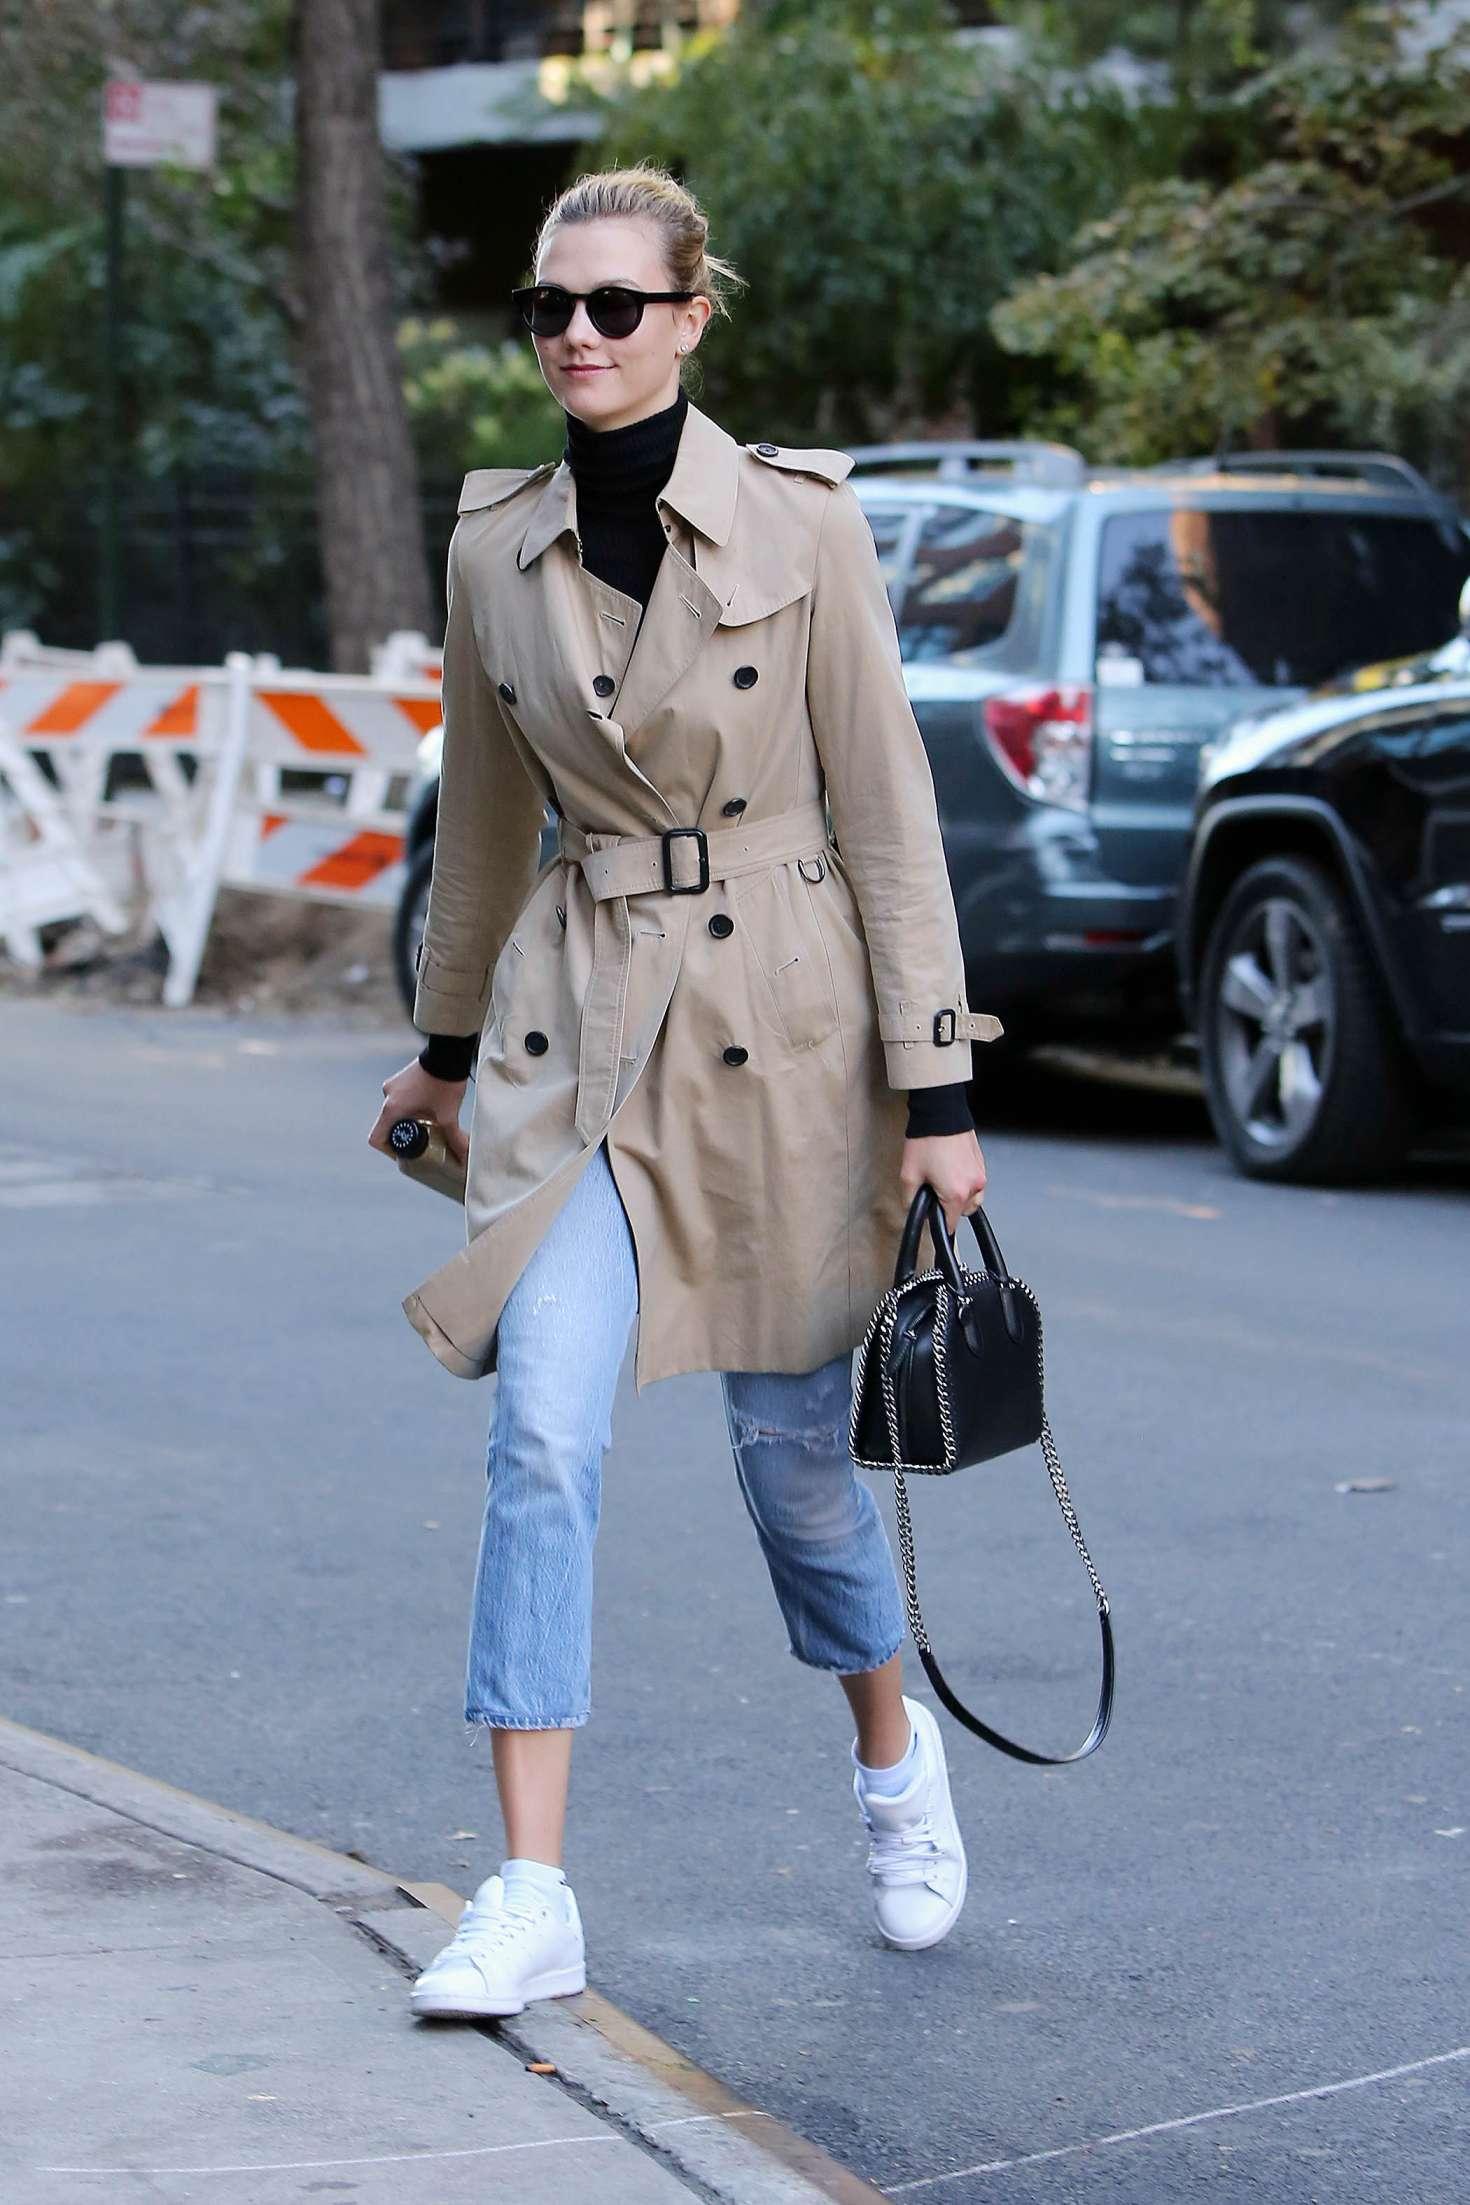 Karlie Kloss 2016 : Karlie Kloss in Jeans and Coat -15